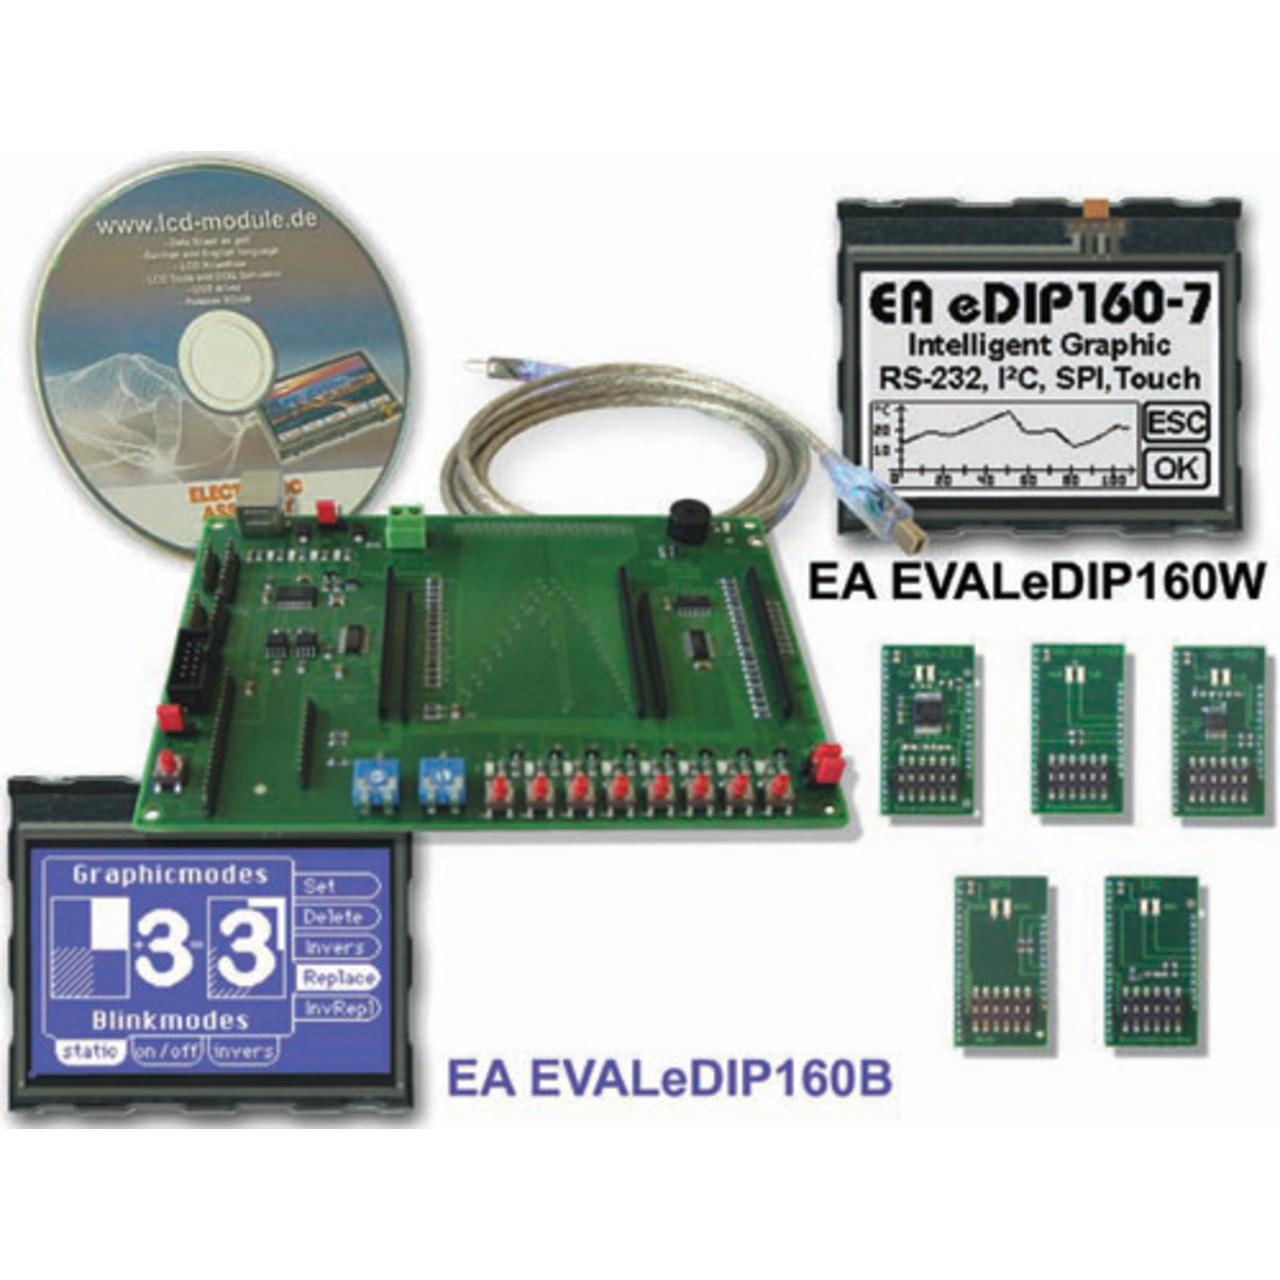 Electronic Assembly Starterkit mit Grafik-LCD EA EVALeDIP160B 160x104 Pixel